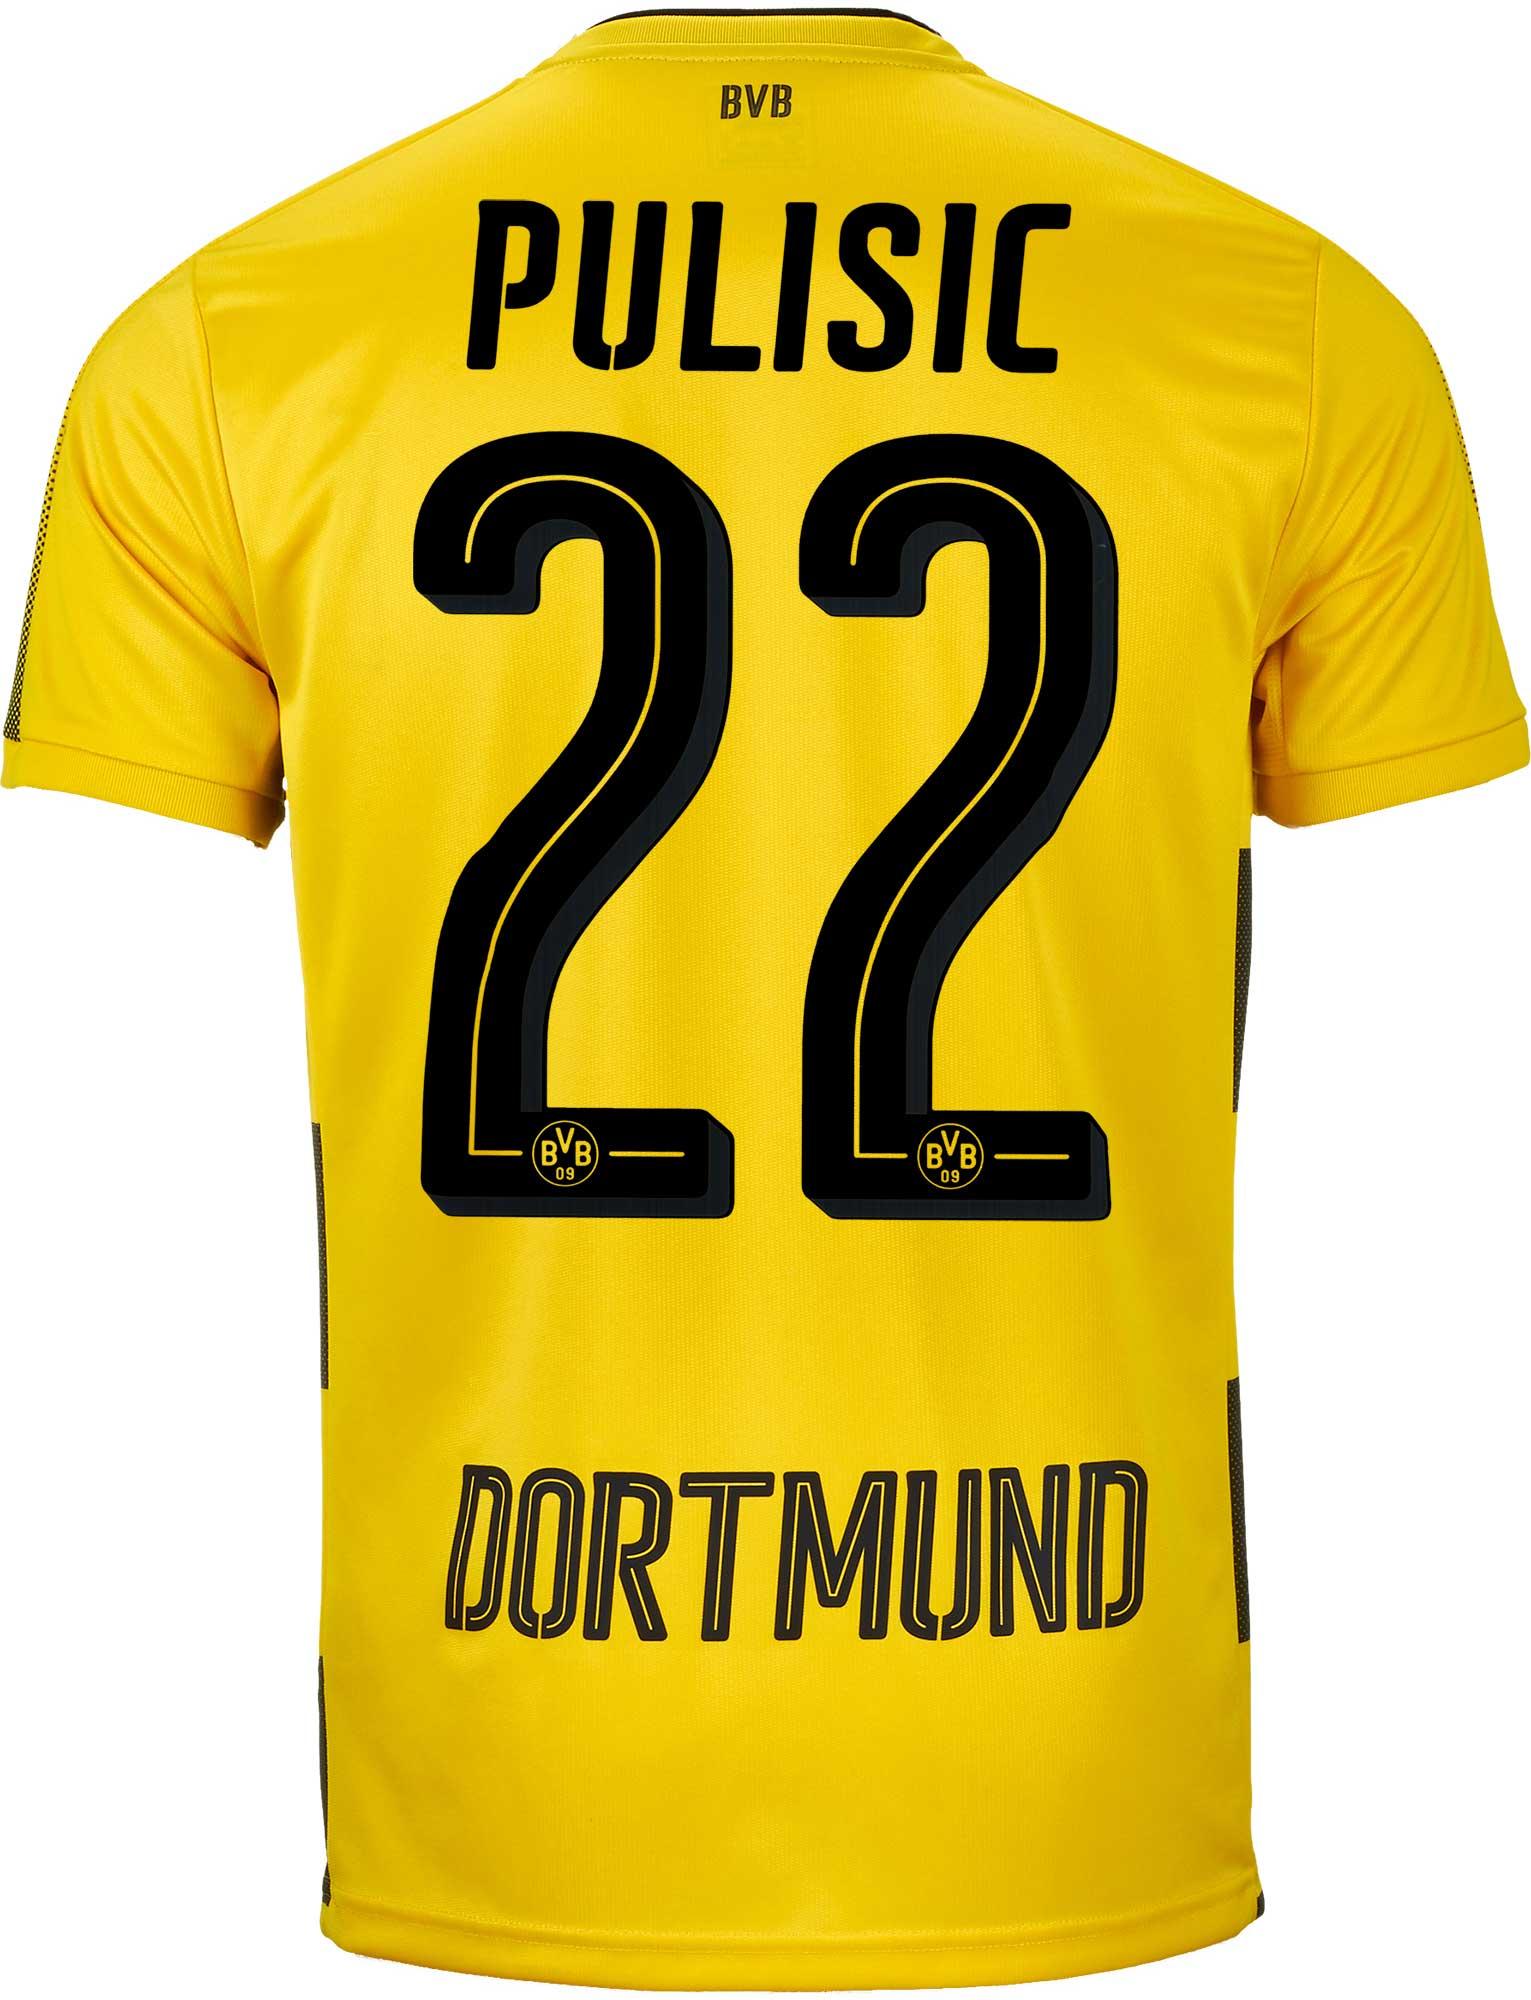 e4335a29d 2017/18 Puma Christian Pulisic Borussia Dortmund Home Jersey